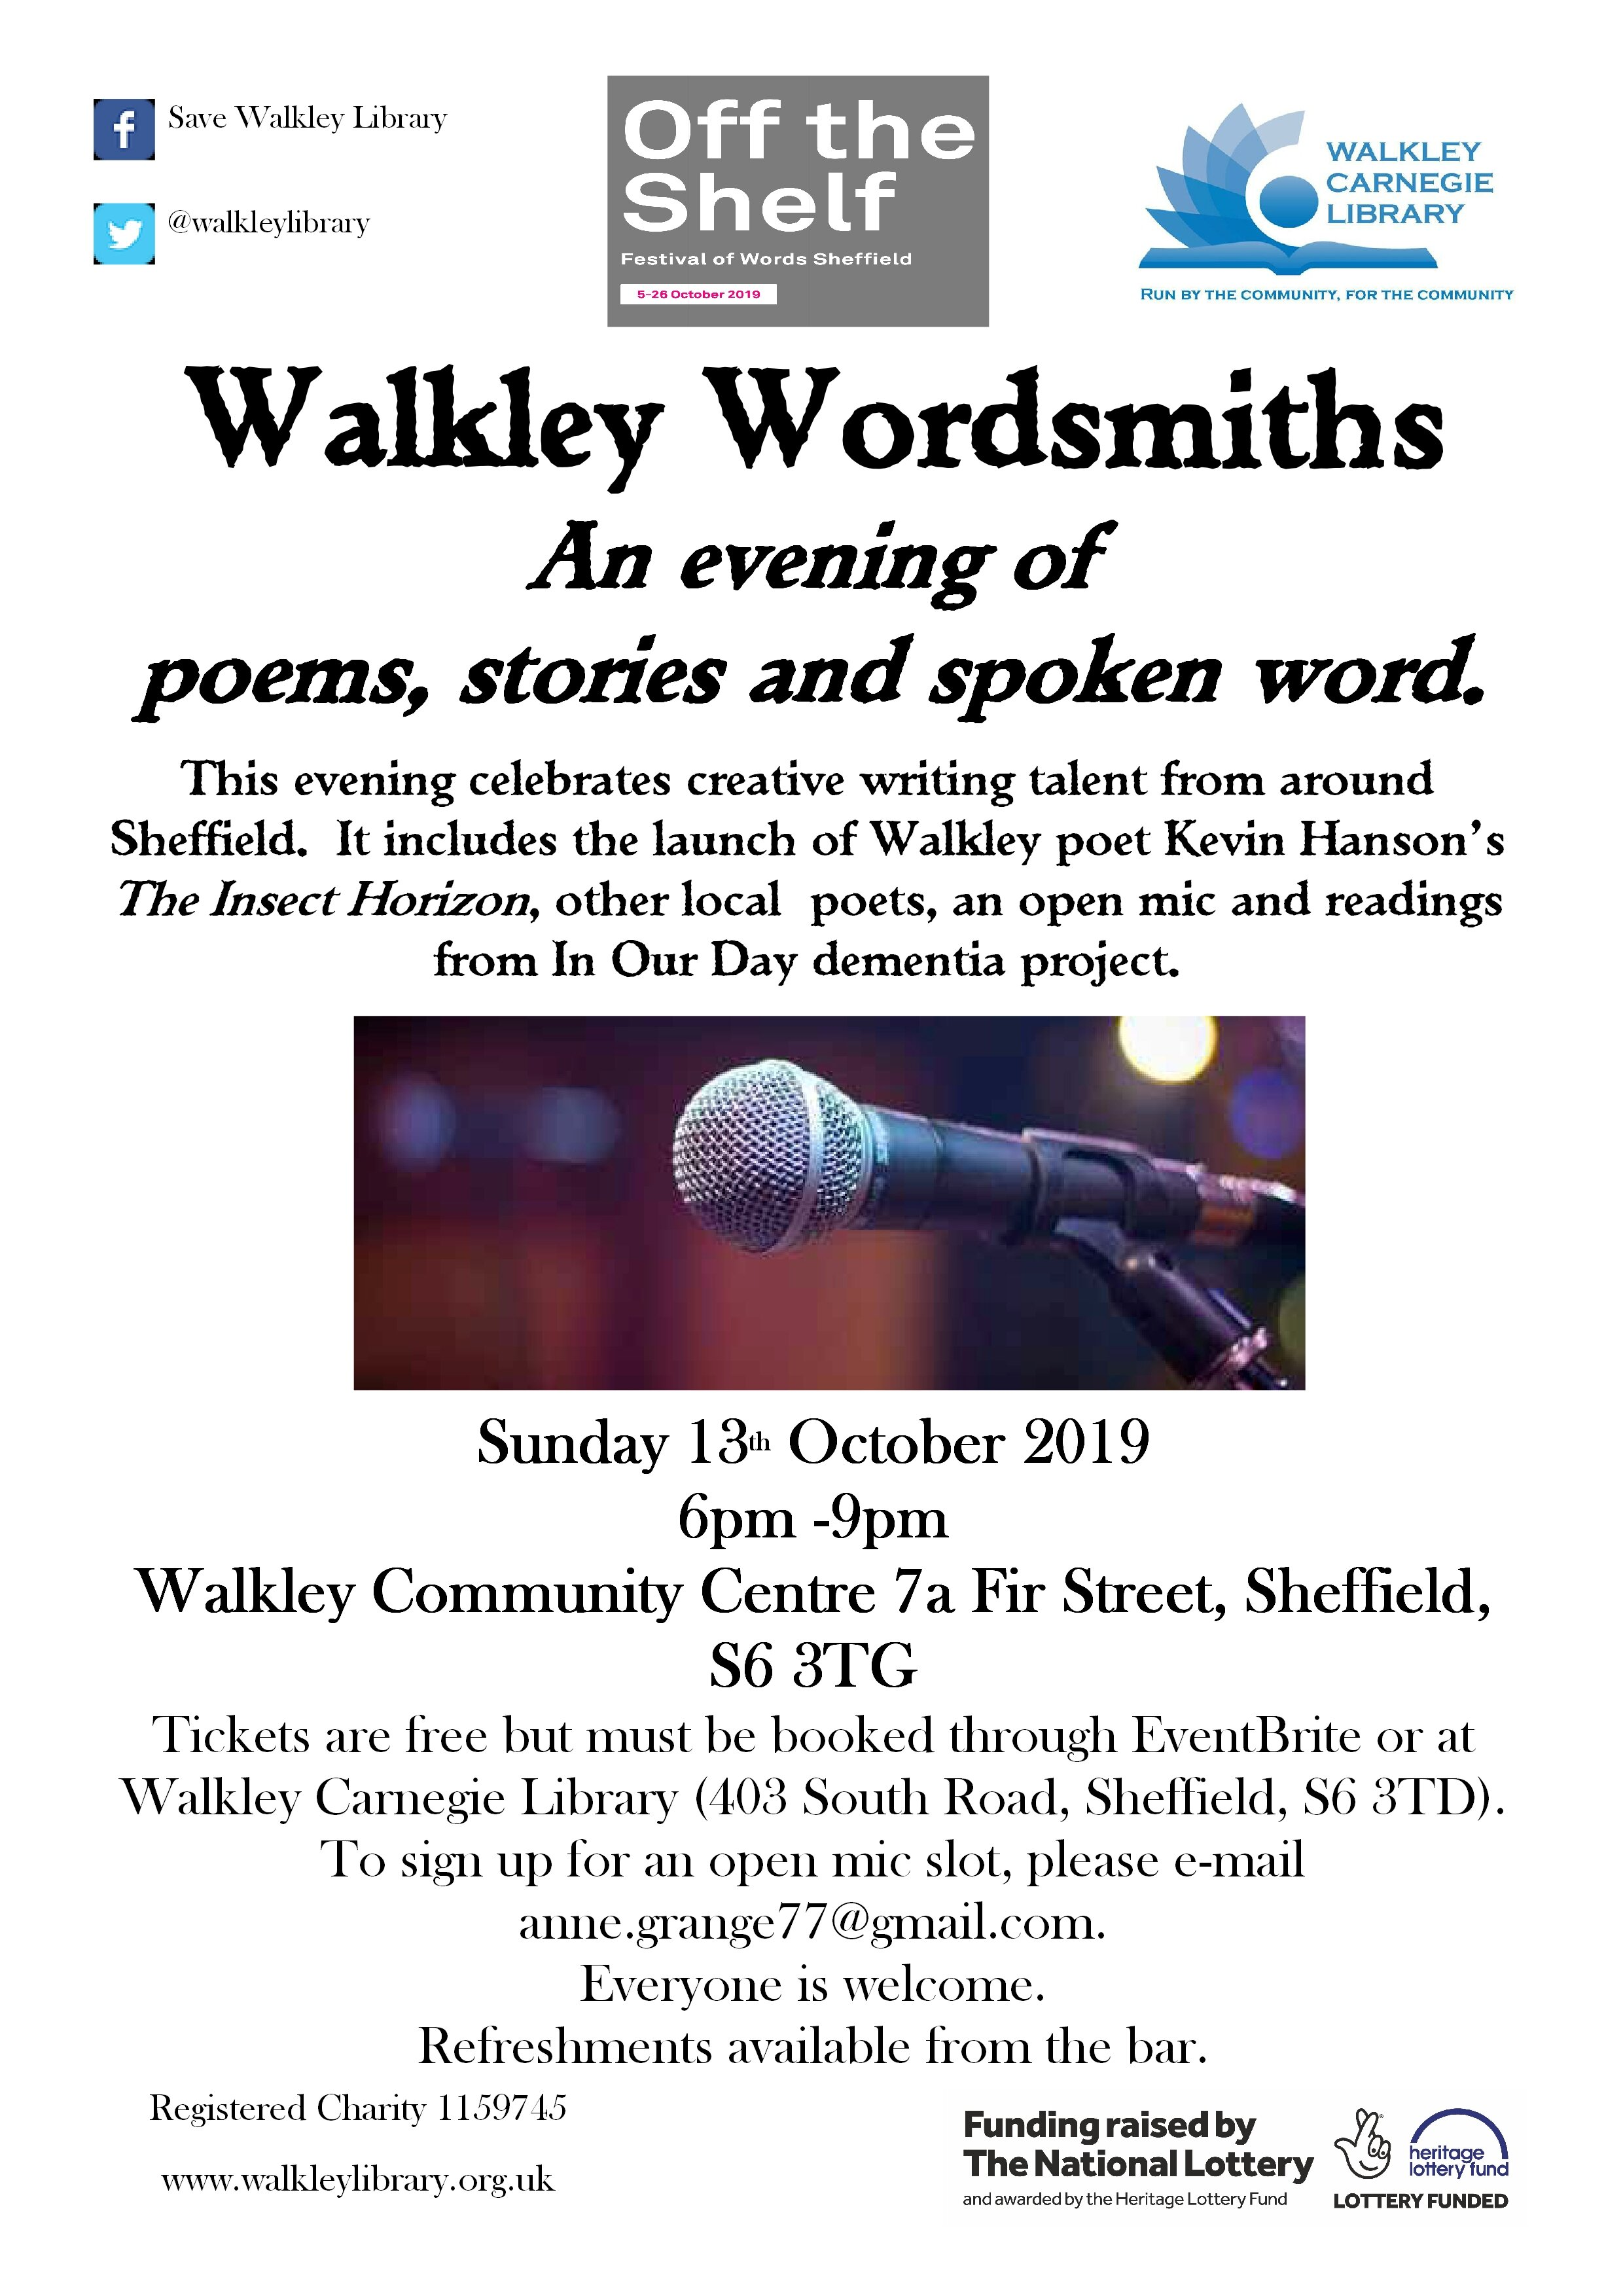 Walkley Wordsmiths 13th October poster (1).jpg